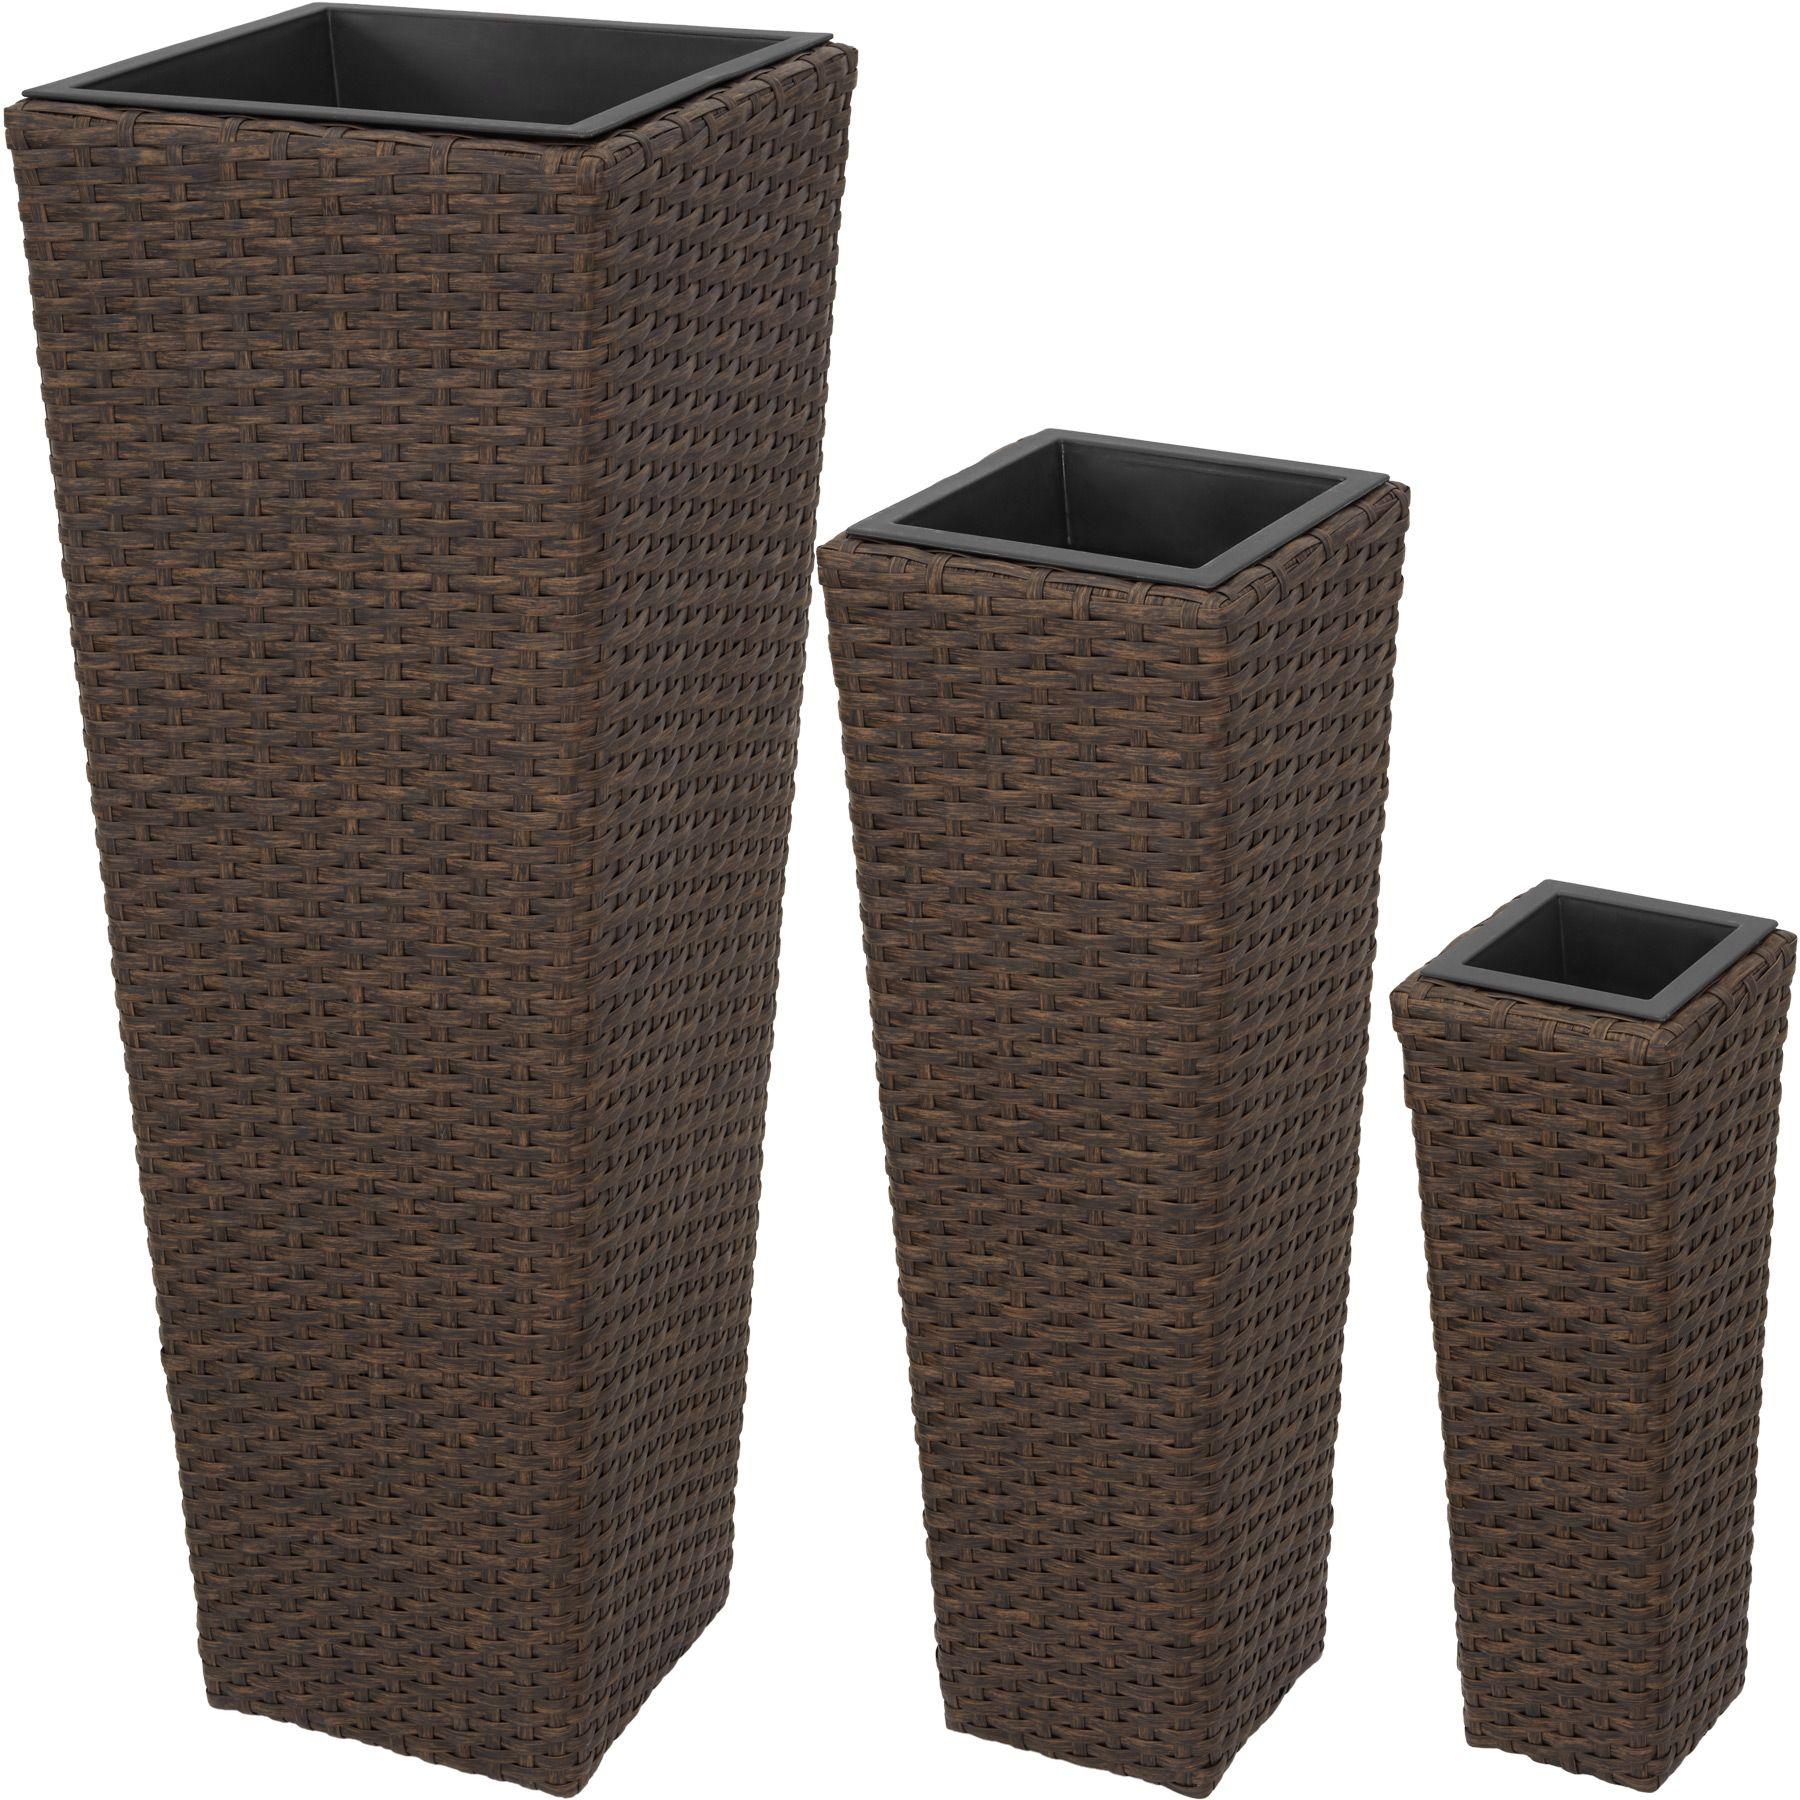 Vasi In Rattan Prezzi.Set Di 3 Vasi Polyrattan Giardino Casa Balcone Arredo Rattan Vaso